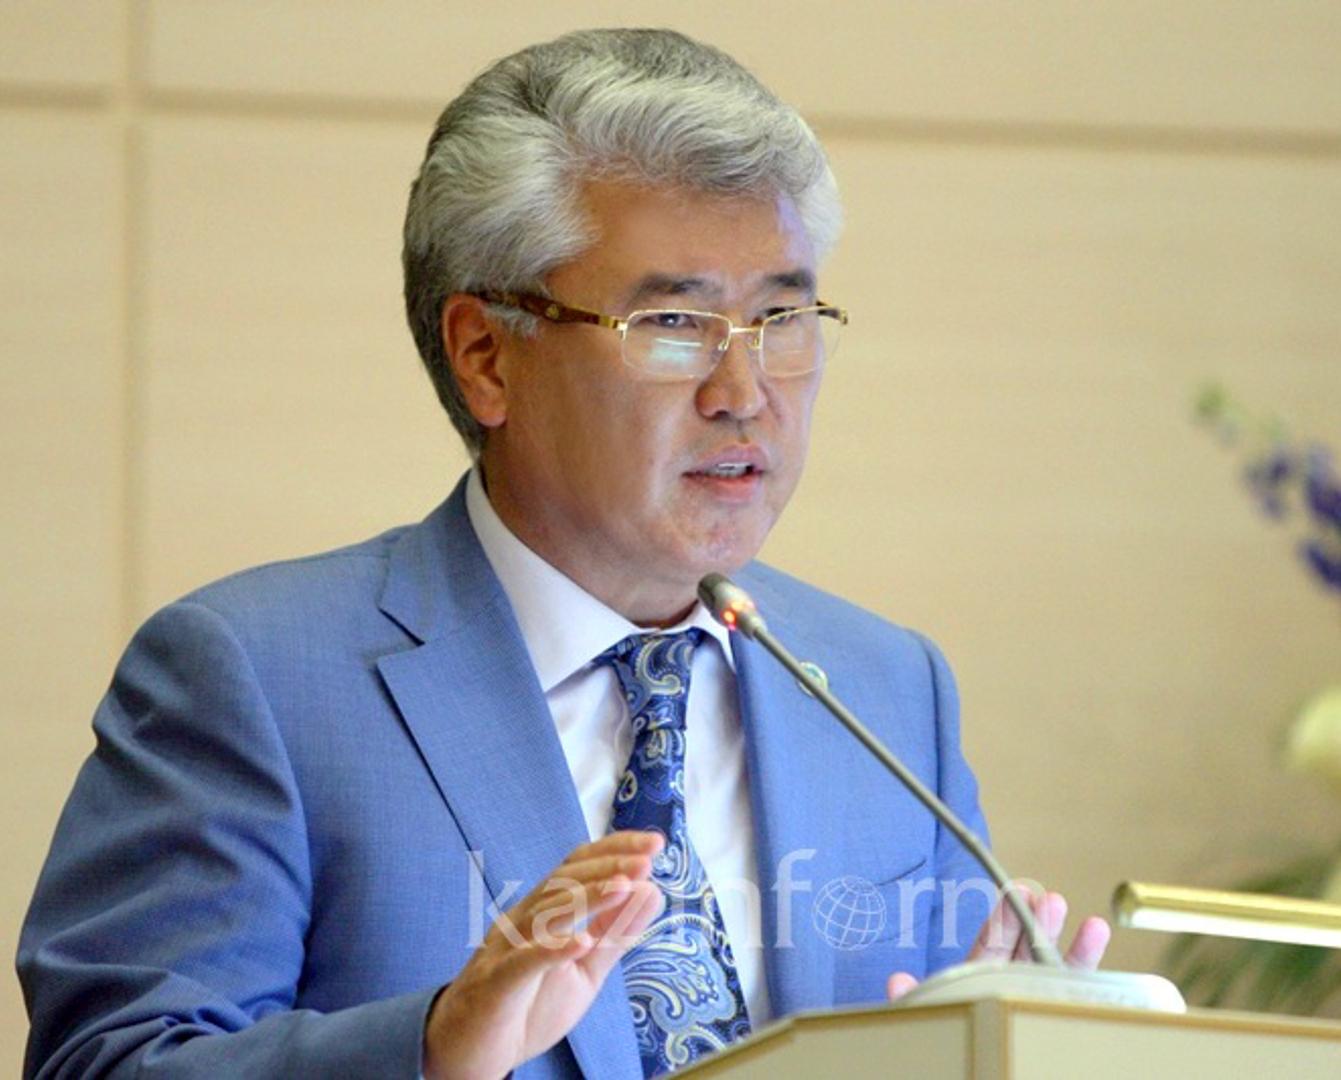 Culture Minister names his favorite tourist destinations in Kazakhstan